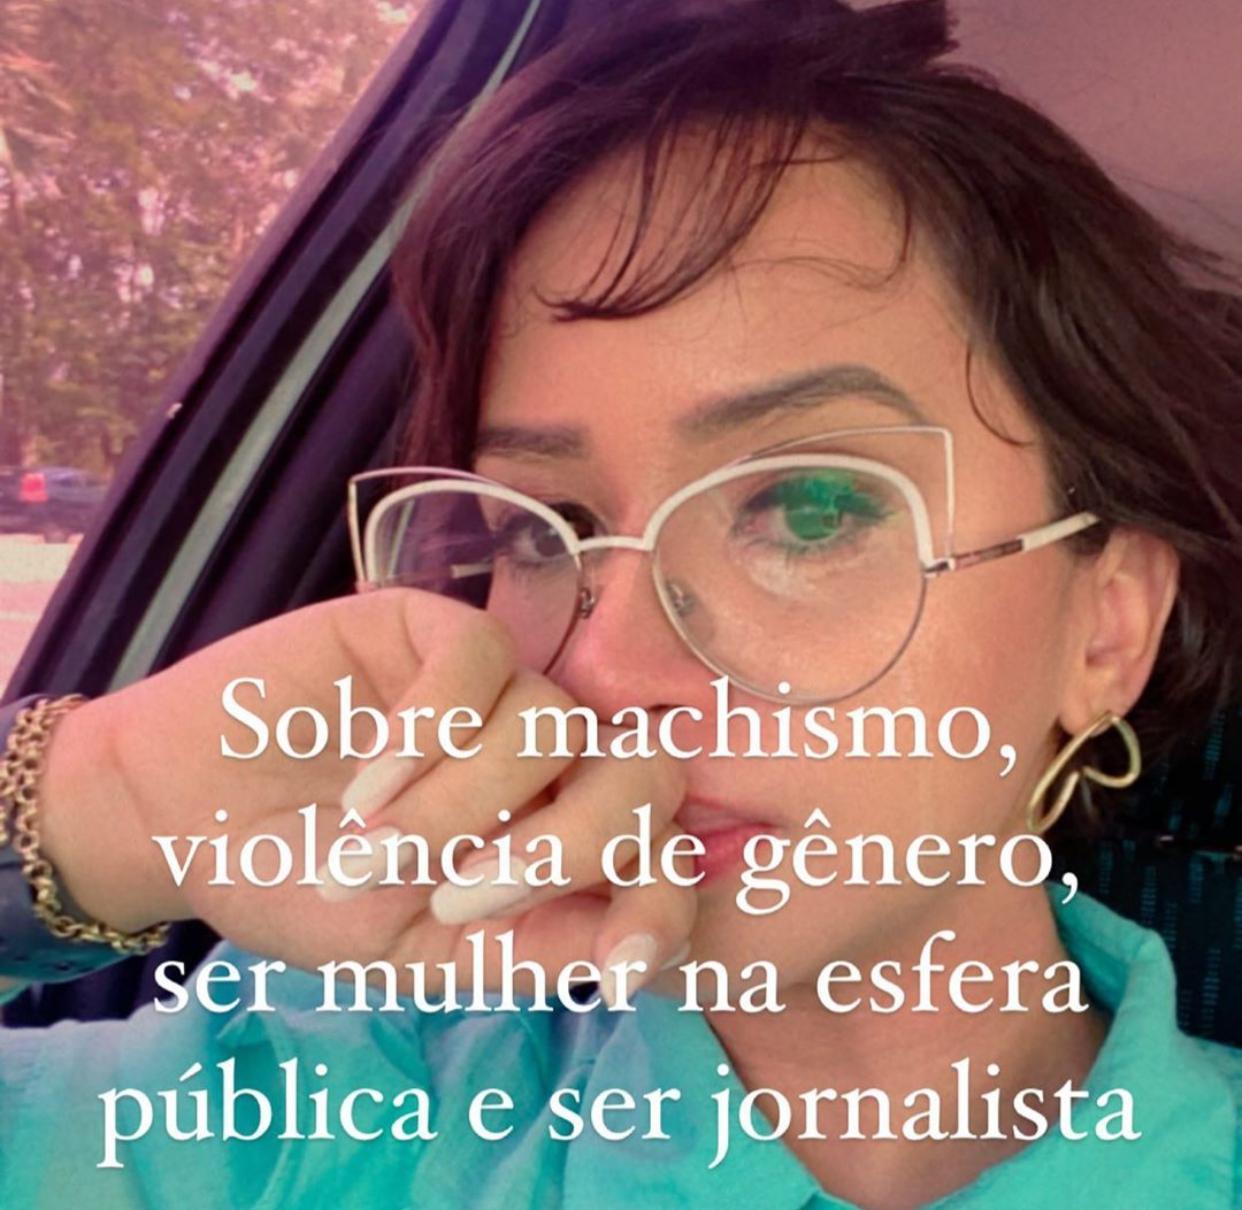 Jornalista Sávia Barreto é comentarista política na Rede Meio Norte e foi intimidada por vereador de Teresina